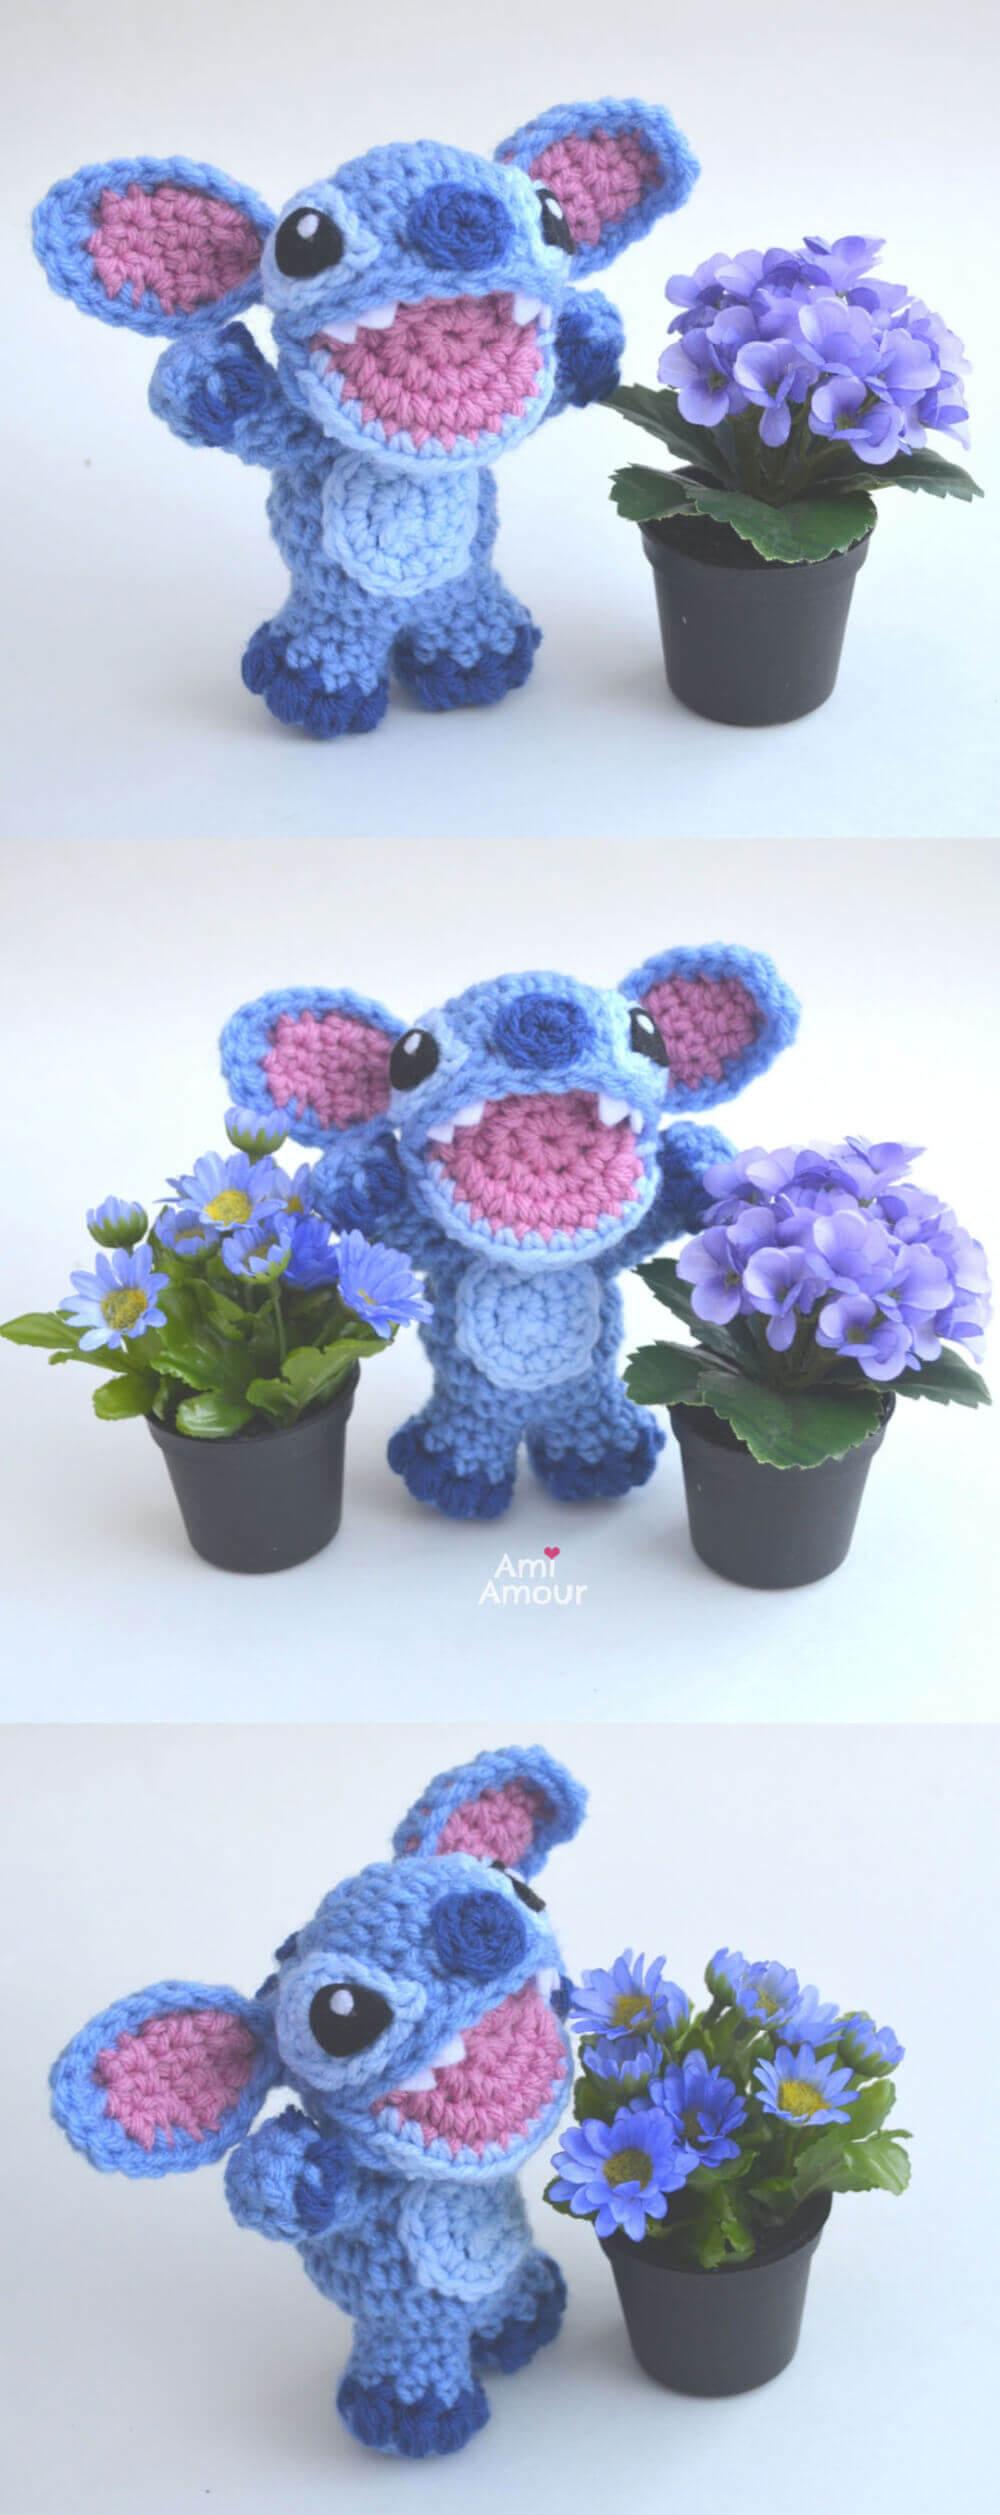 Stitch Amigurumi with Flowers - Free Crochet Pattern